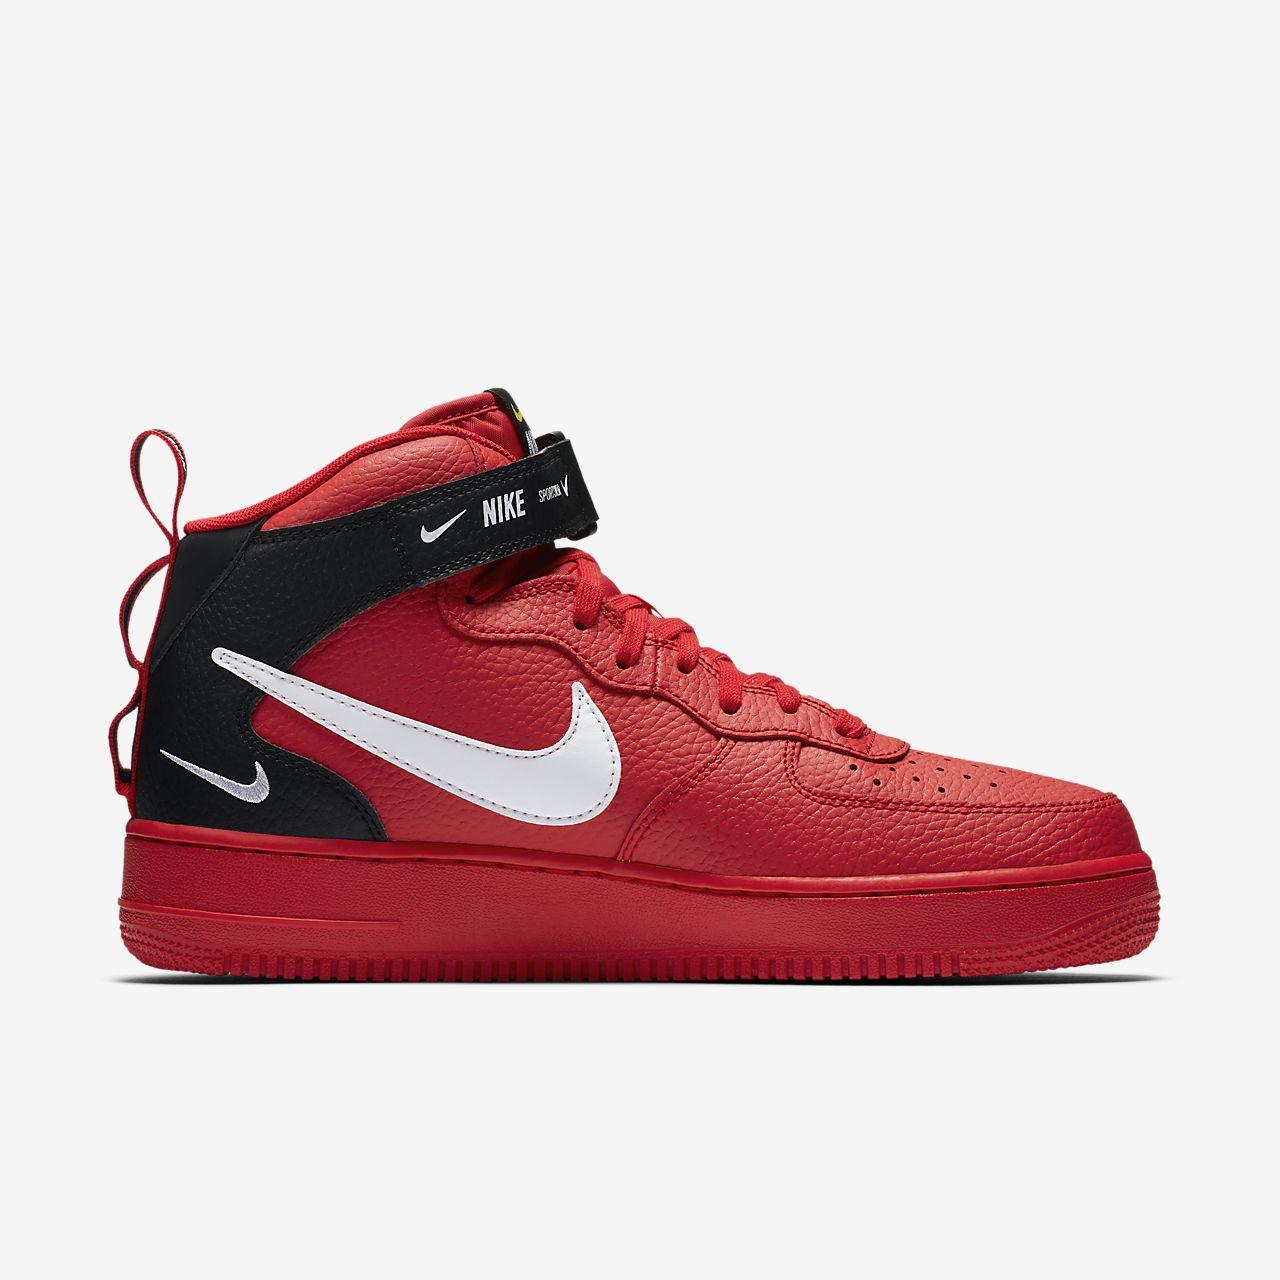 new arrivals 93642 e17f5 ... Nike Air Force 1 07 Mid LV8 Mens Shoe